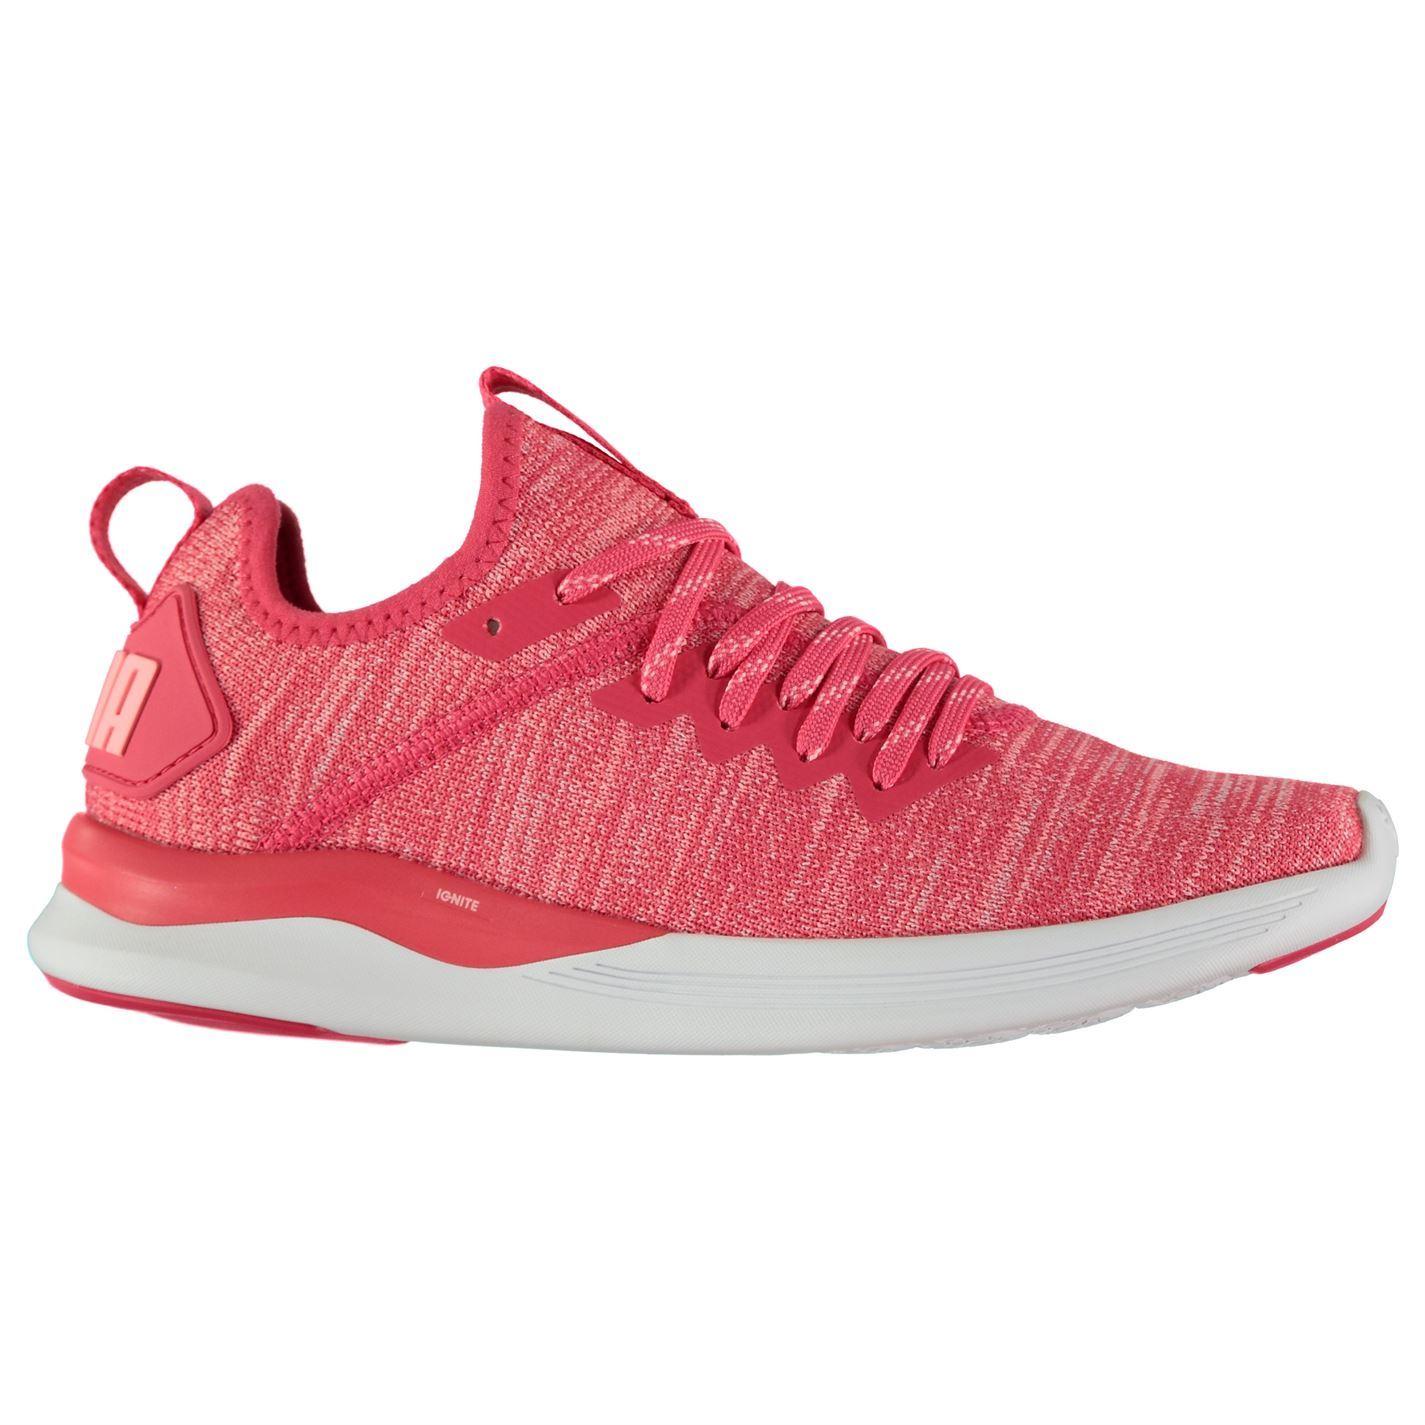 Puma Damenschuhe Ignite Flash Trainers Runners Training Slip On Knit Pattern Training Runners 912cc7